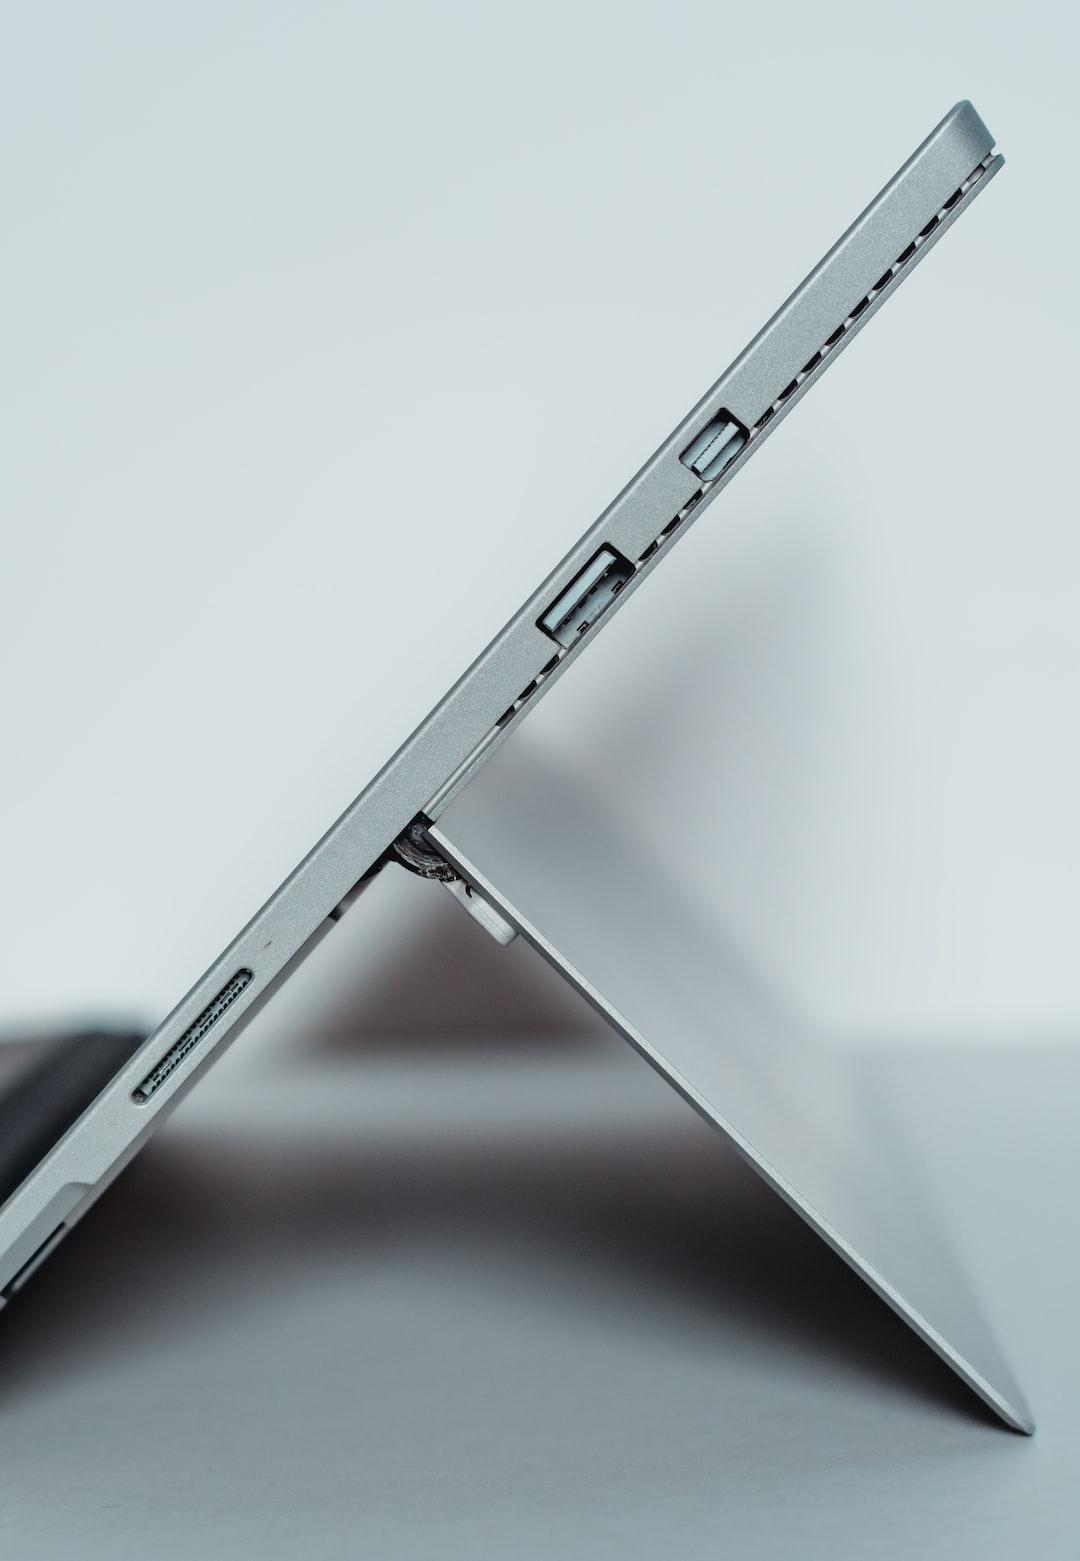 Microsoft Surface Pro with Keyboard